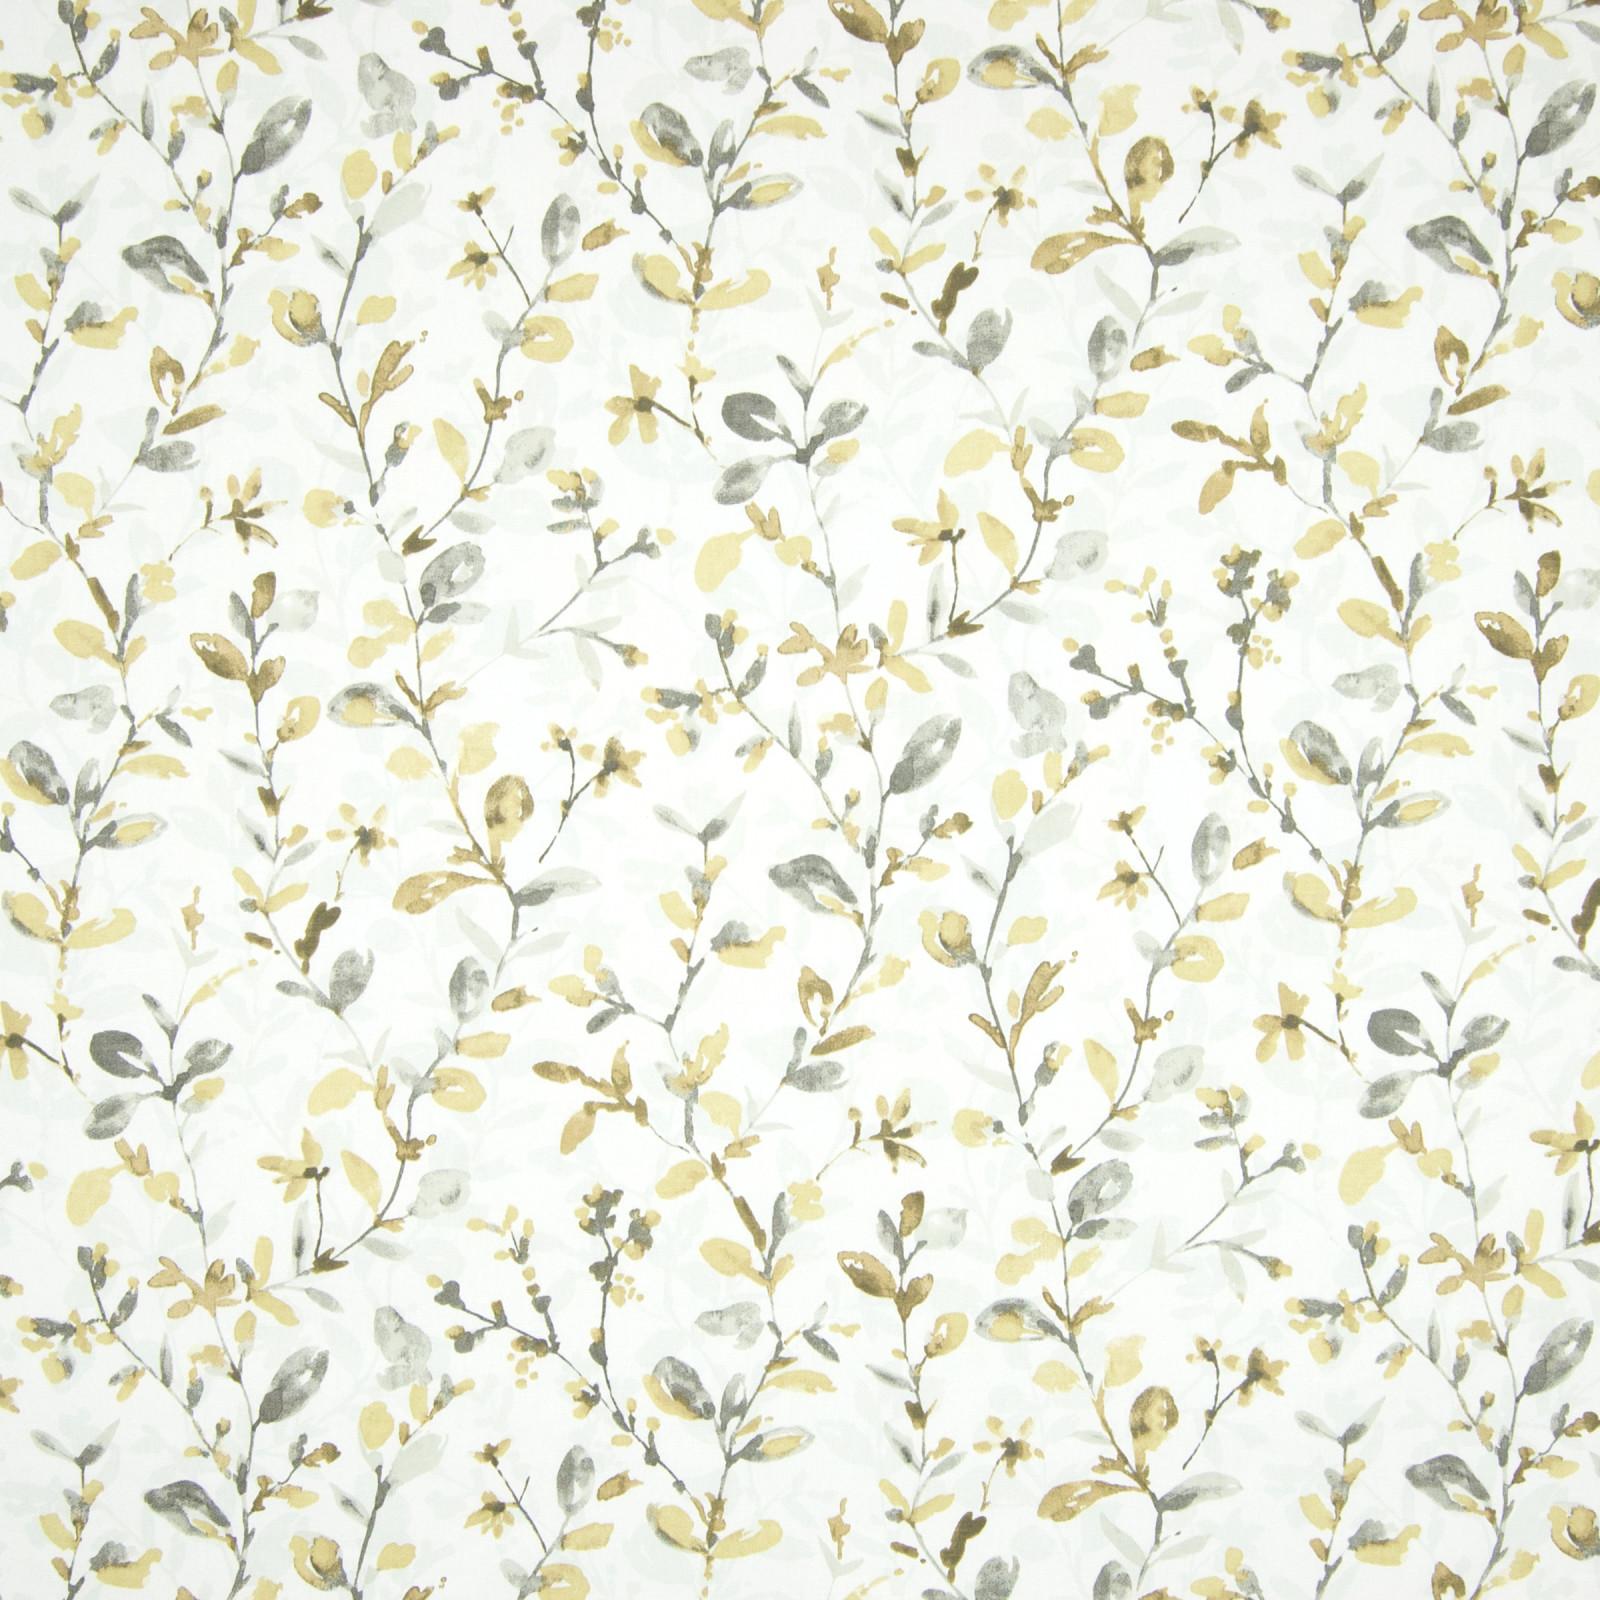 B7199 Gold Dust Greenhouse Fabrics